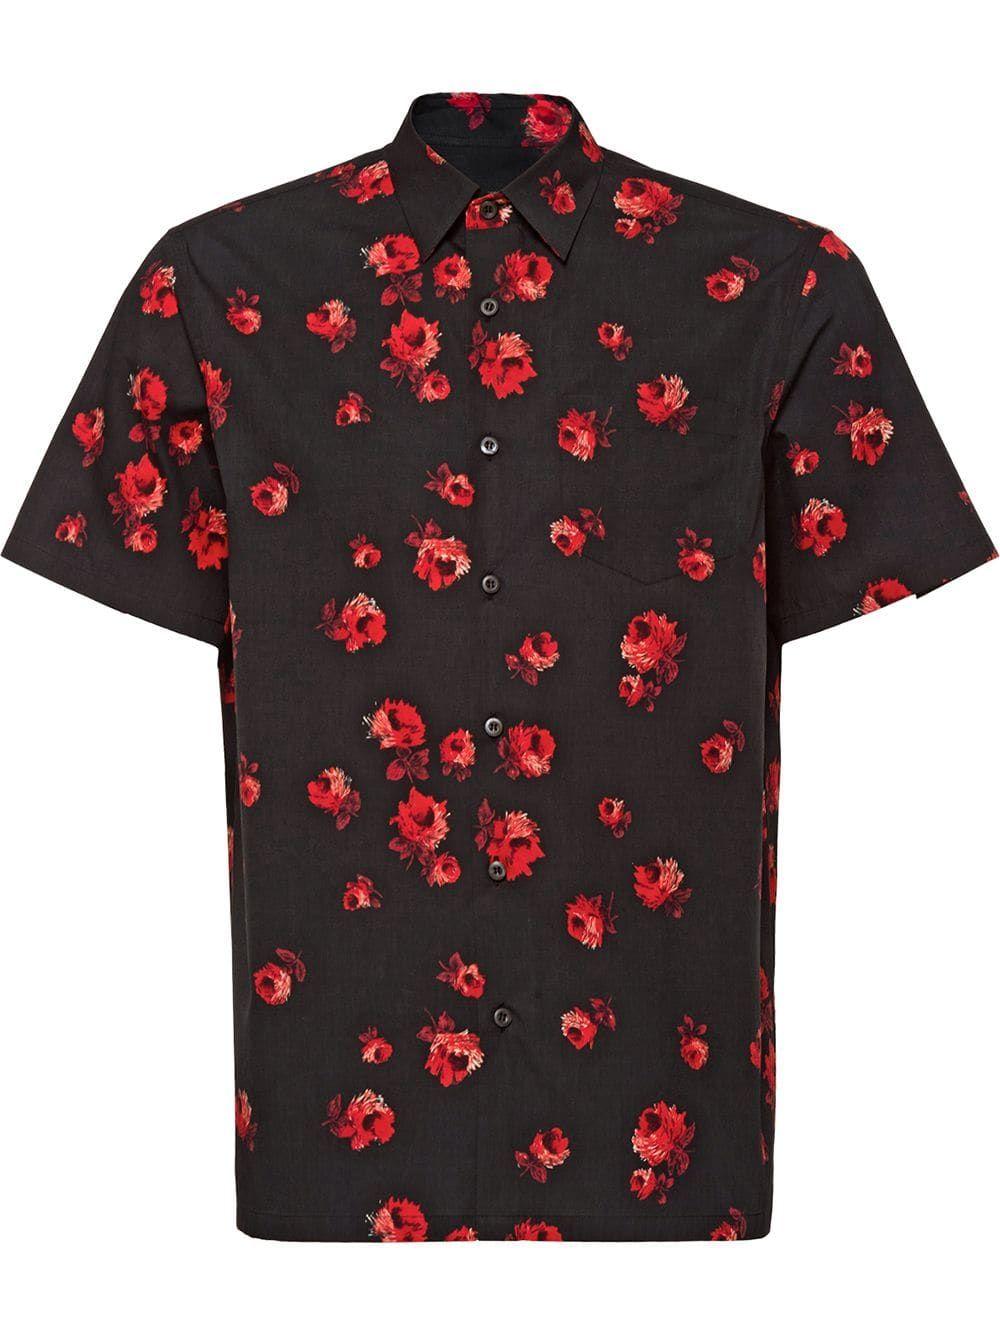 75679f45 Prada T Shirt Mens Uk - Nils Stucki Kieferorthopäde